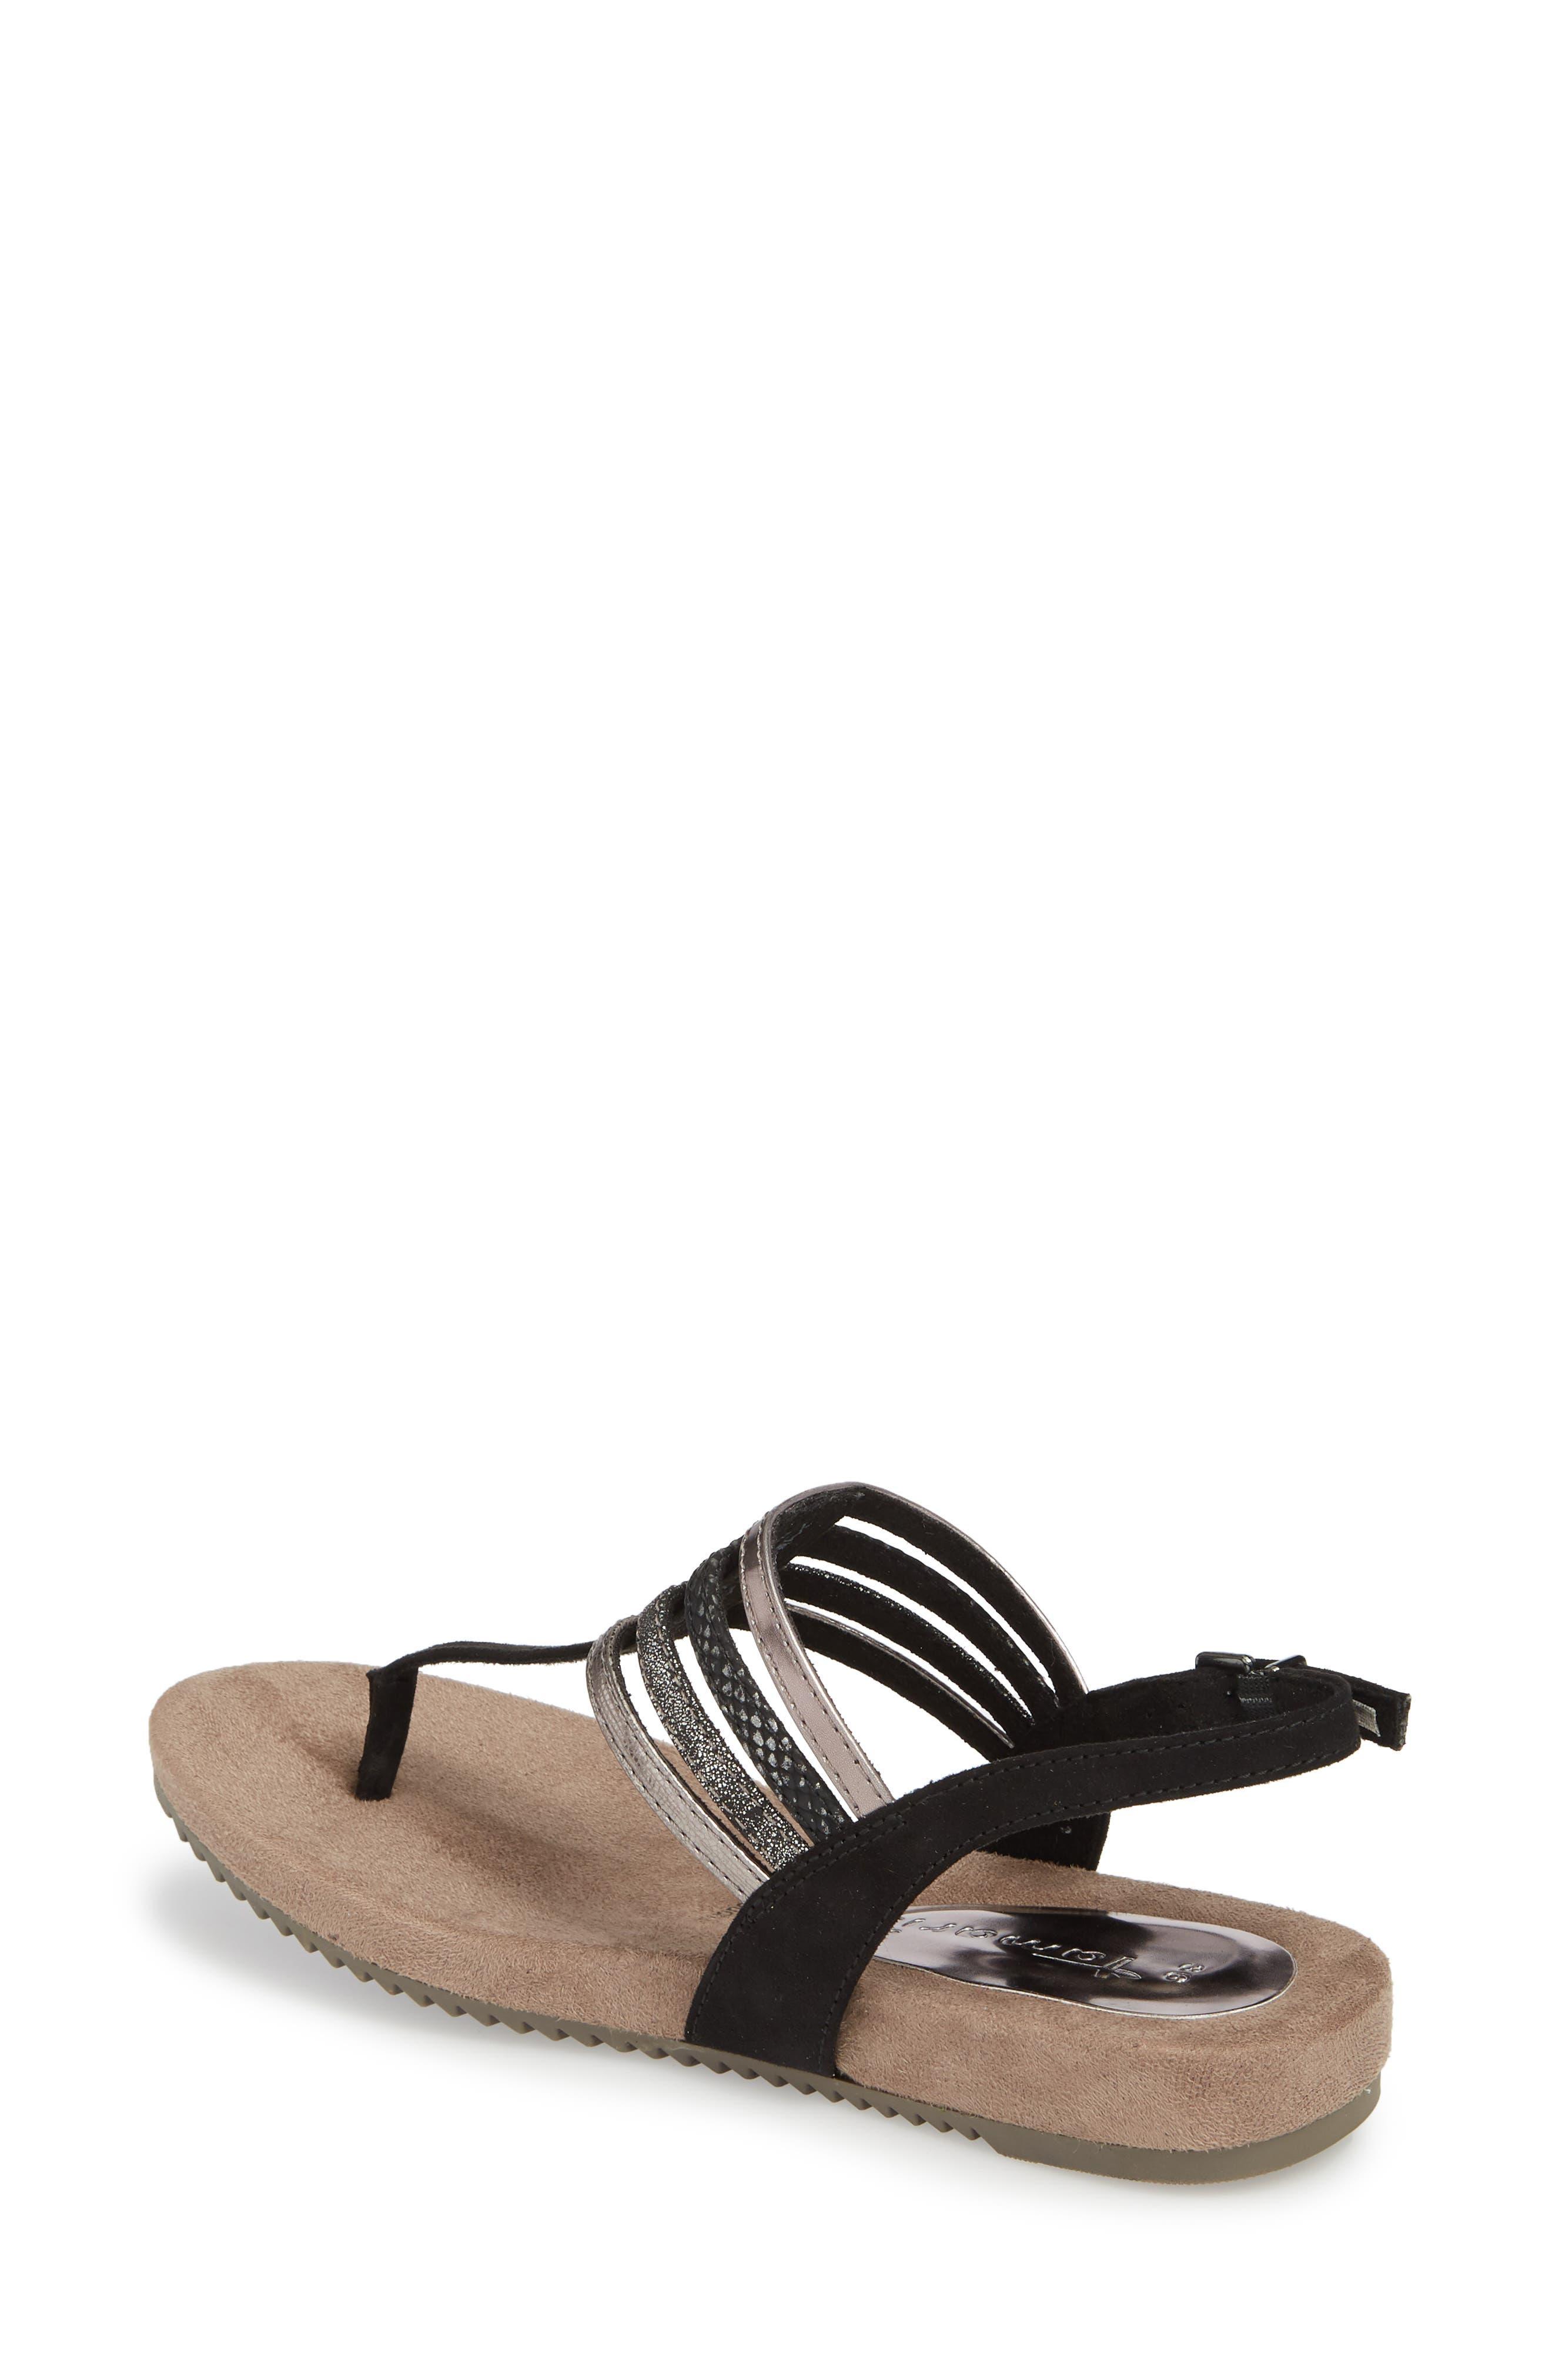 Locust Sandal,                             Alternate thumbnail 2, color,                             Black Fabric